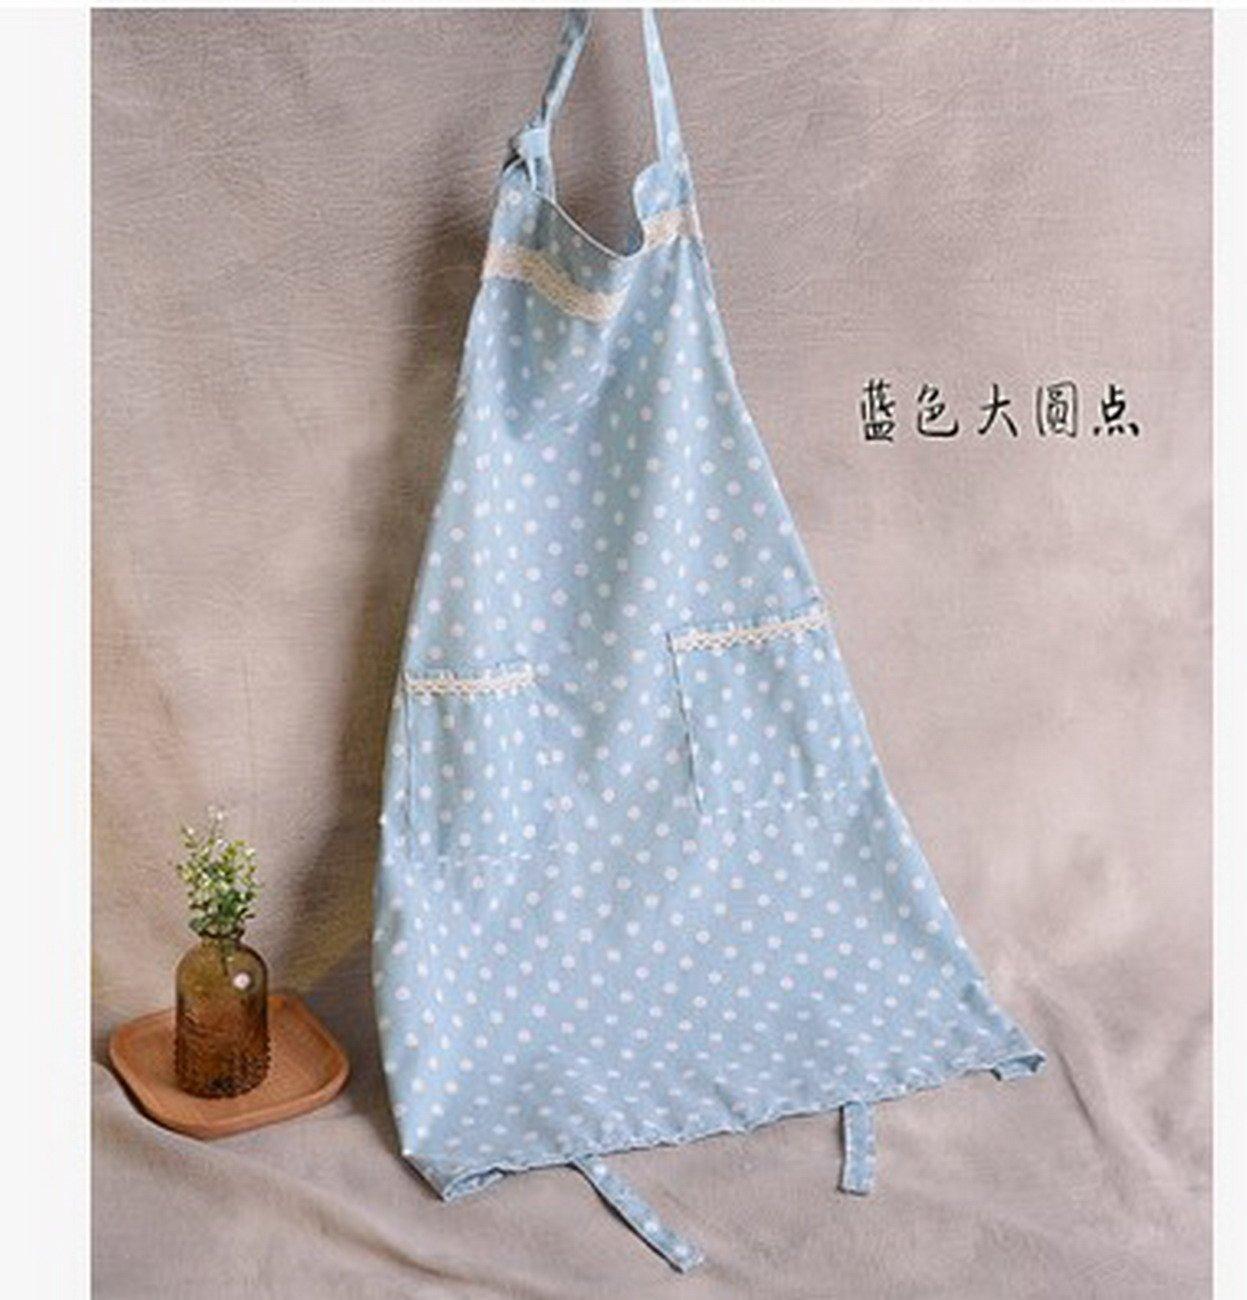 Geranjie韓国ファッションリネンストライプメンズandレディースエプロンウェイター調節可能な2ポケットシェフ作業ホームキッチン料理Painting Tablier   B078W1B52P